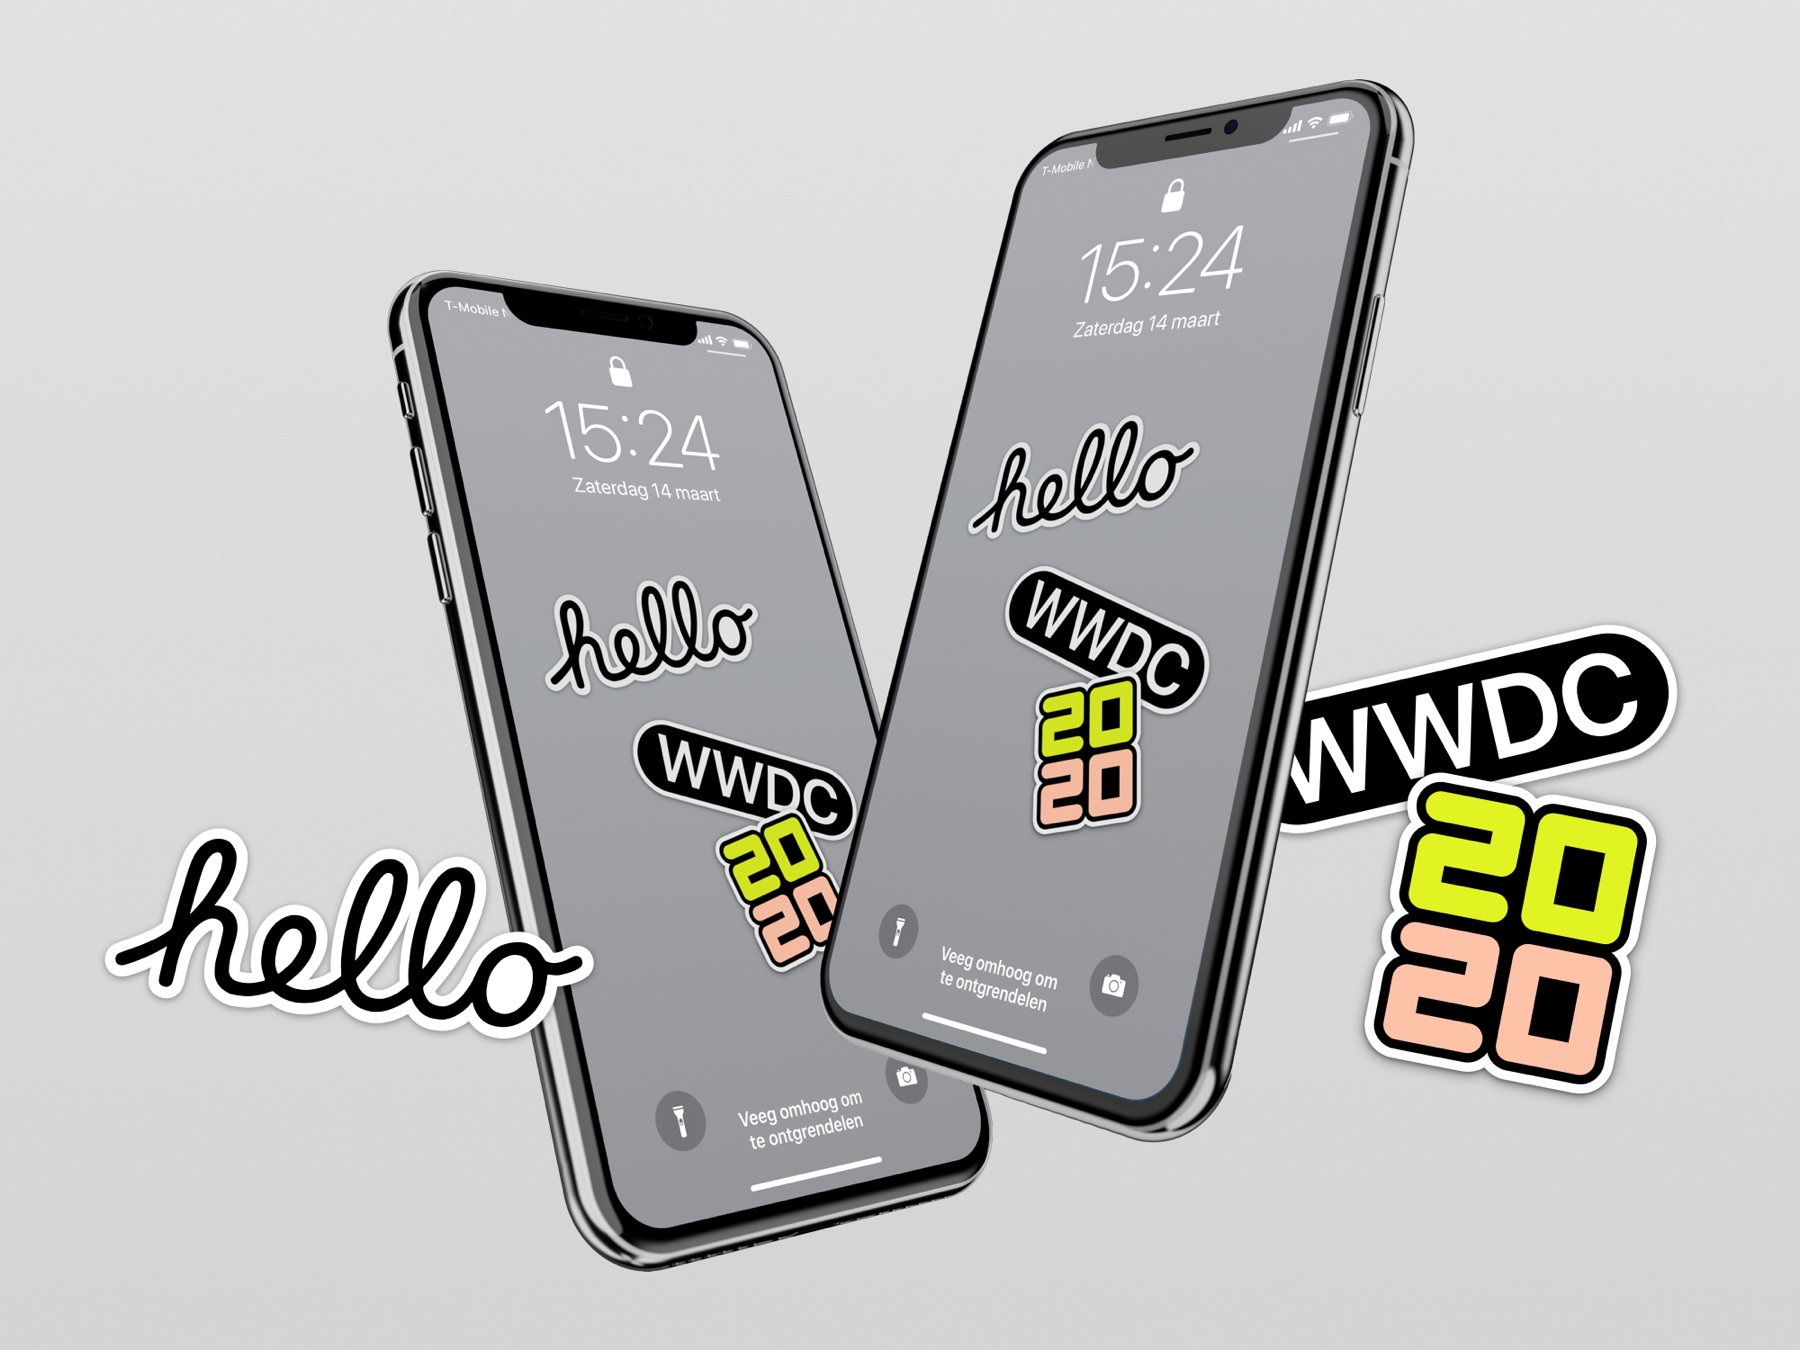 wwdc 2020 wallpaper basvanderploeg idownloadblog mockup